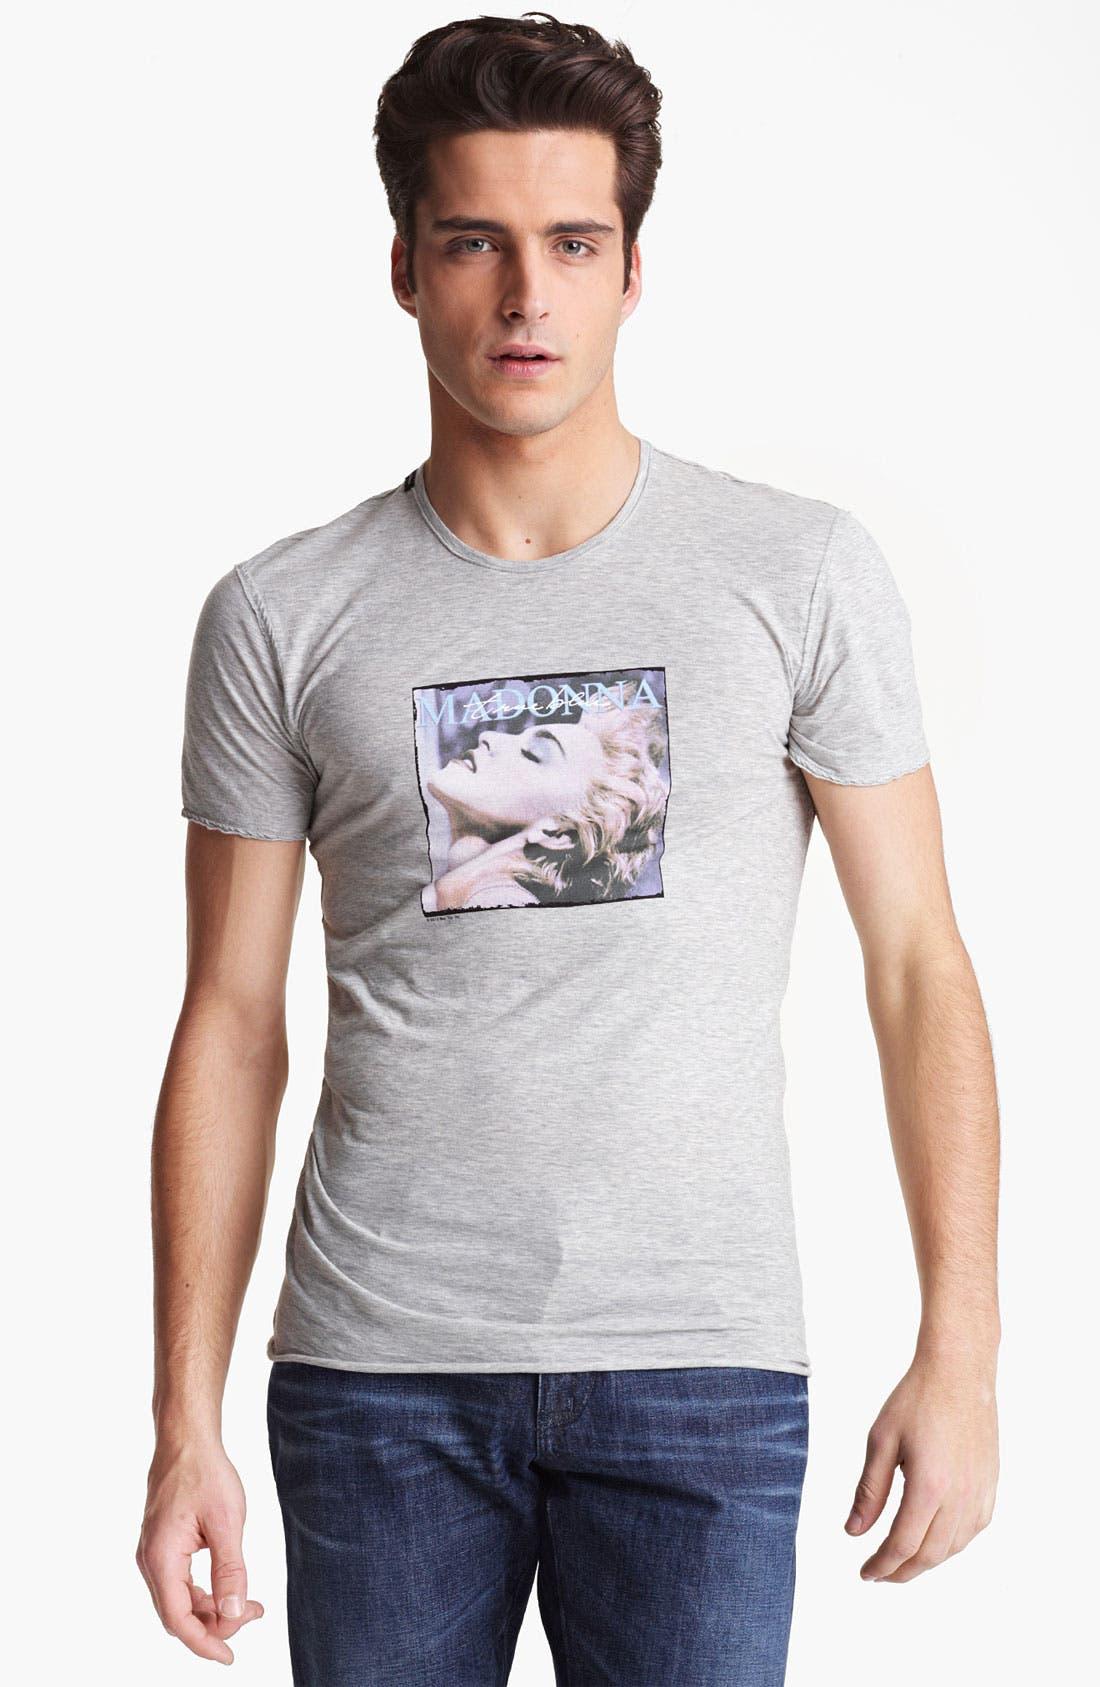 Alternate Image 1 Selected - Dolce&Gabbana 'Madonna - True Blue' Graphic T-Shirt